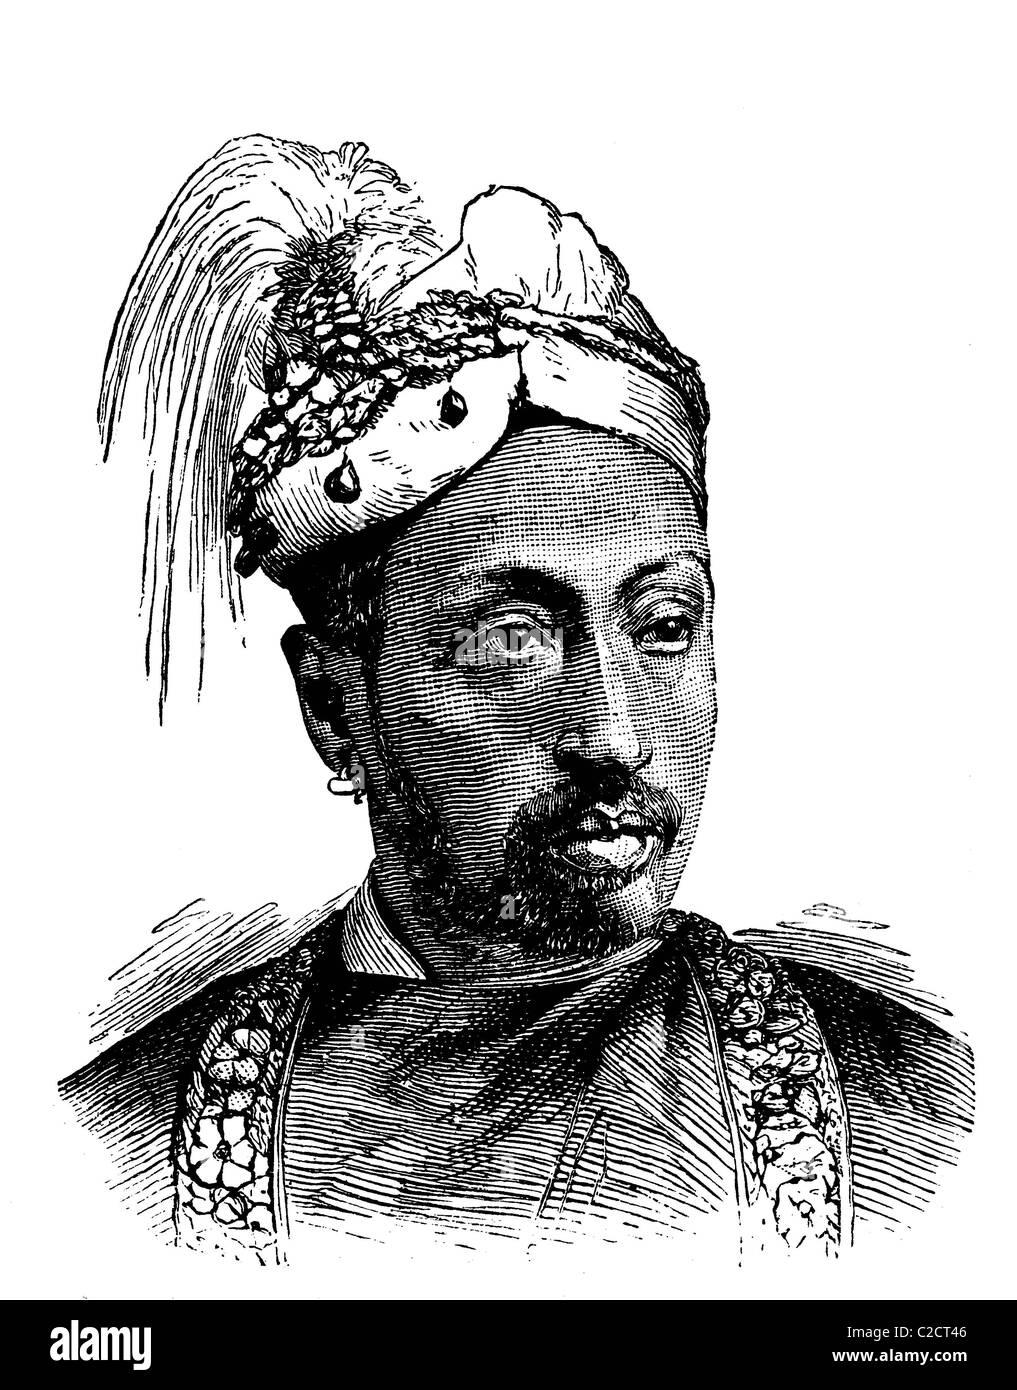 Sir Rama Varma, Maharaja of Travancore, historical illustration, 1884 Stock Photo